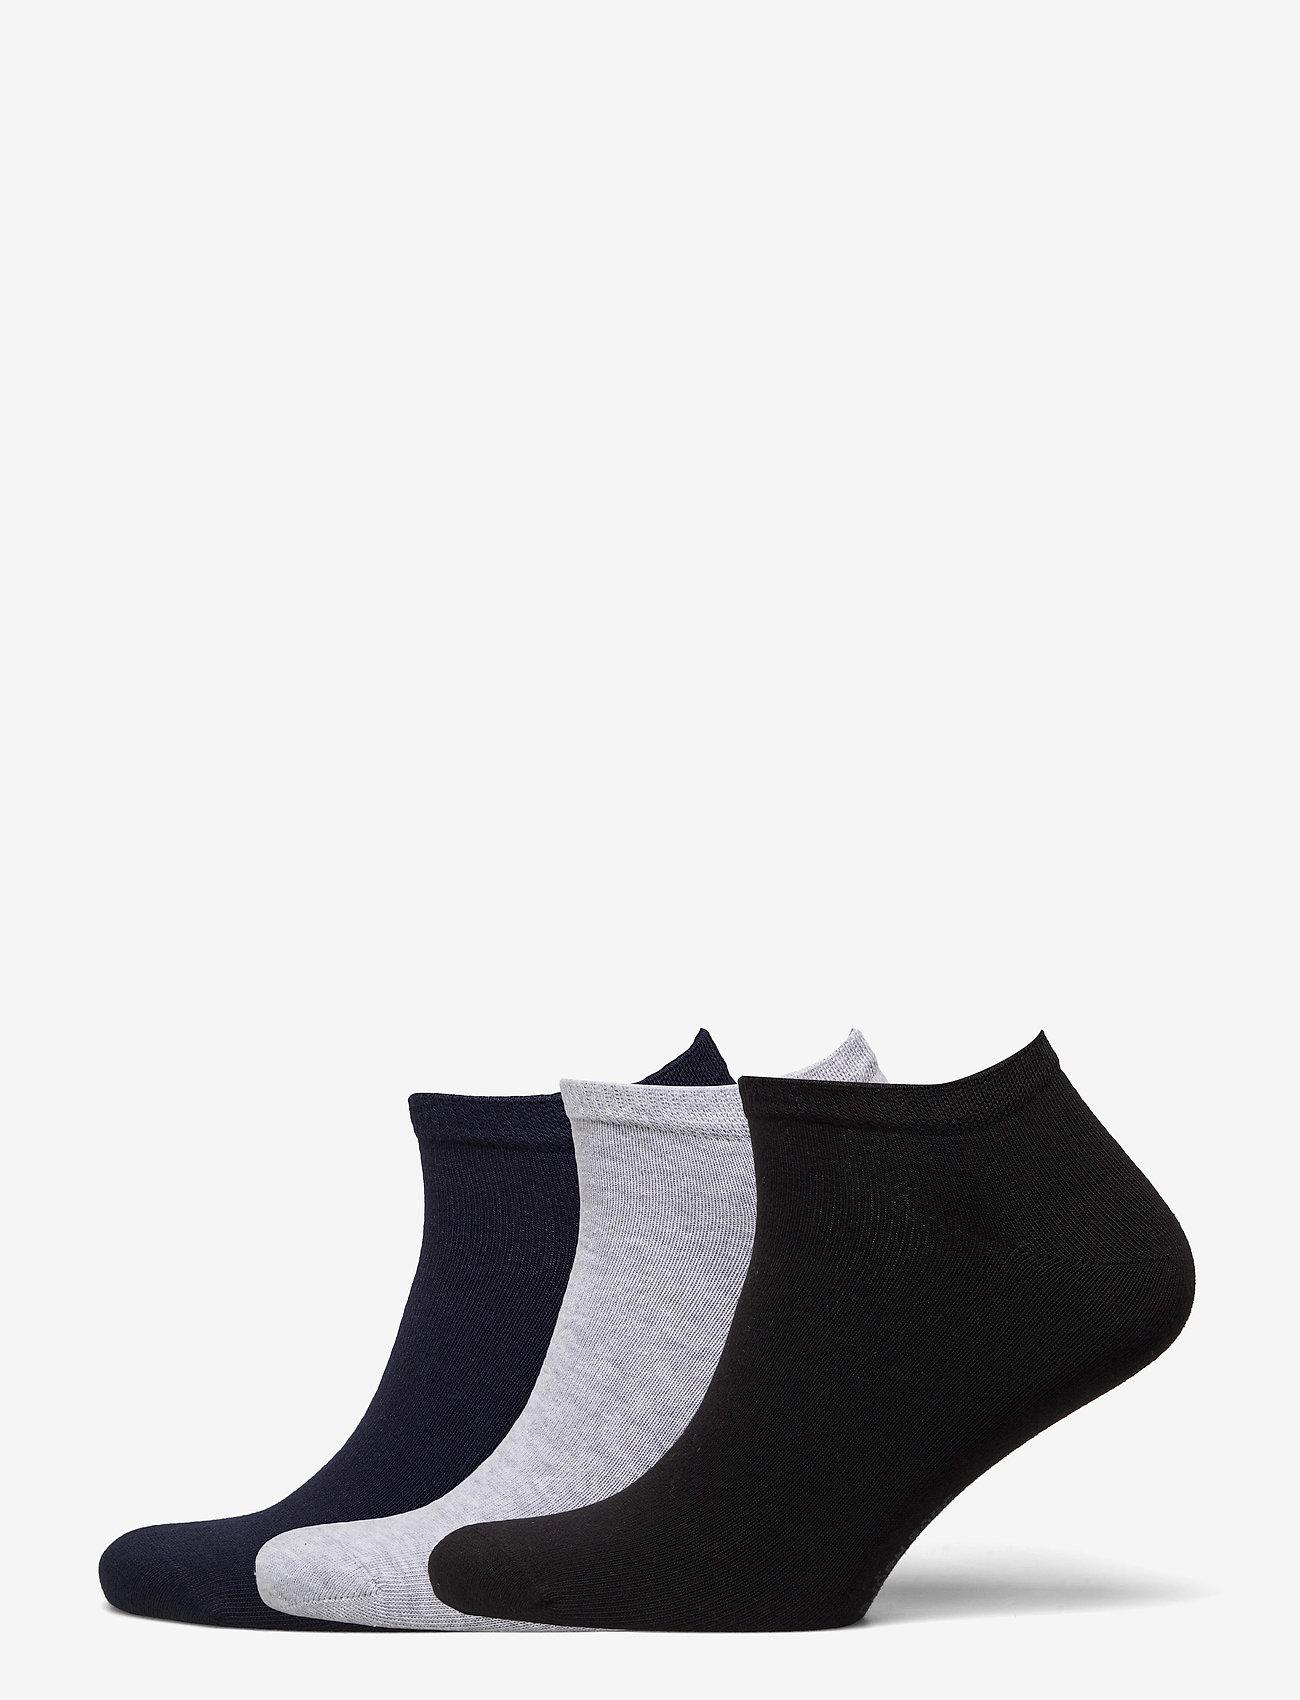 Björn Borg - SOCK STEP SOLID ESSENTIAL - ankle socks - black - 0